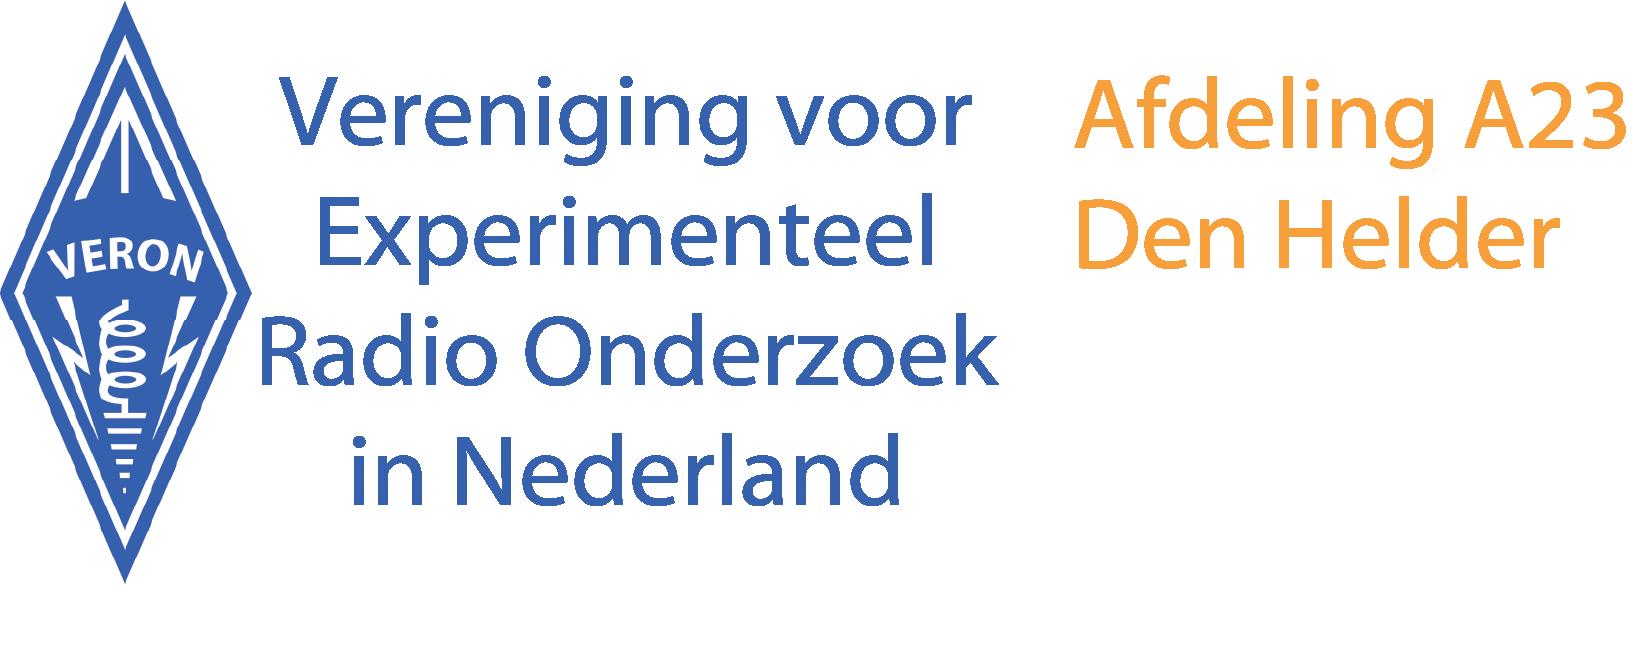 VERON A23 - Den Helder